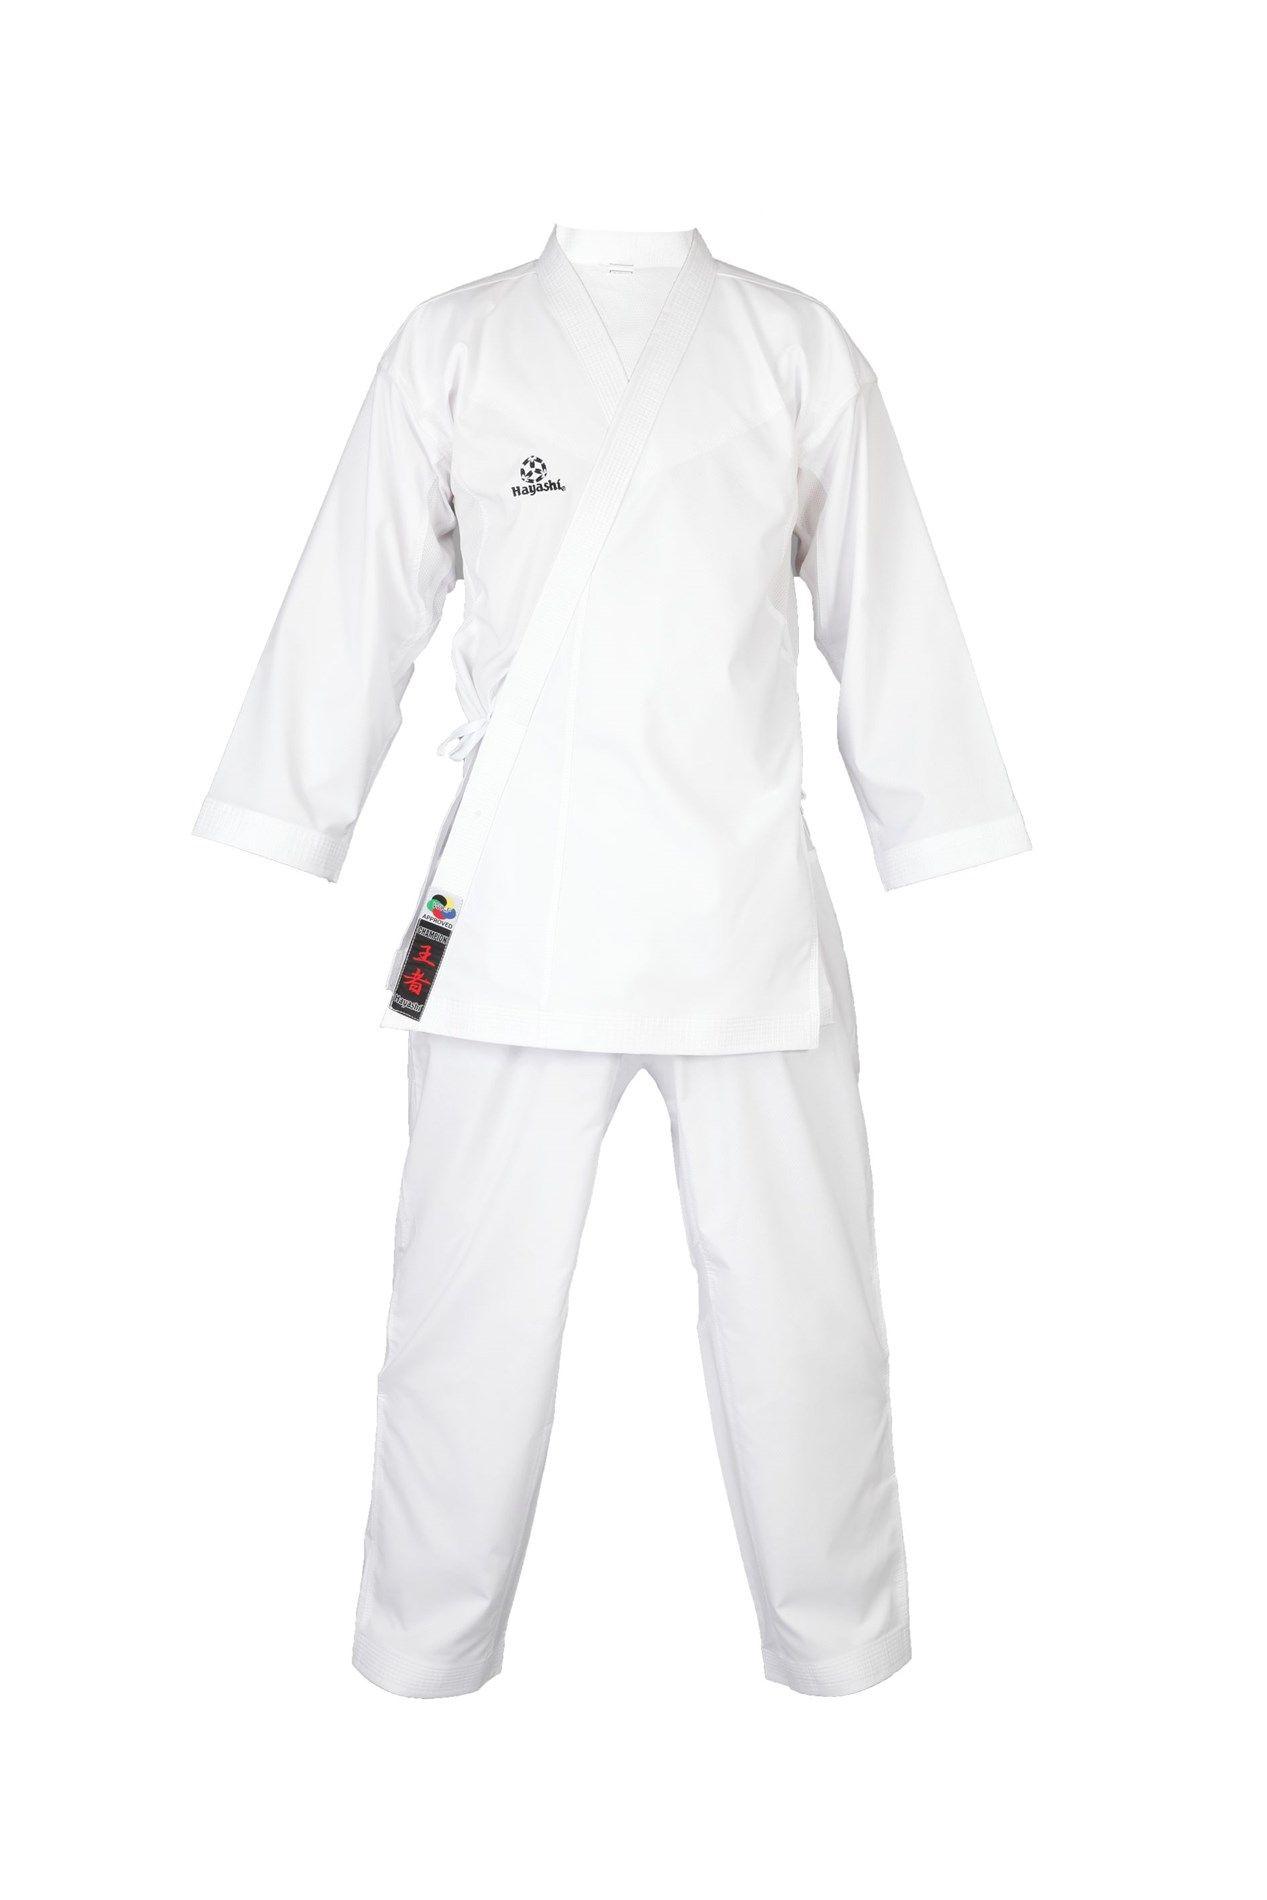 "Hayashi Karatepak ""Champion Flexz"" (WKF approved) Wit"